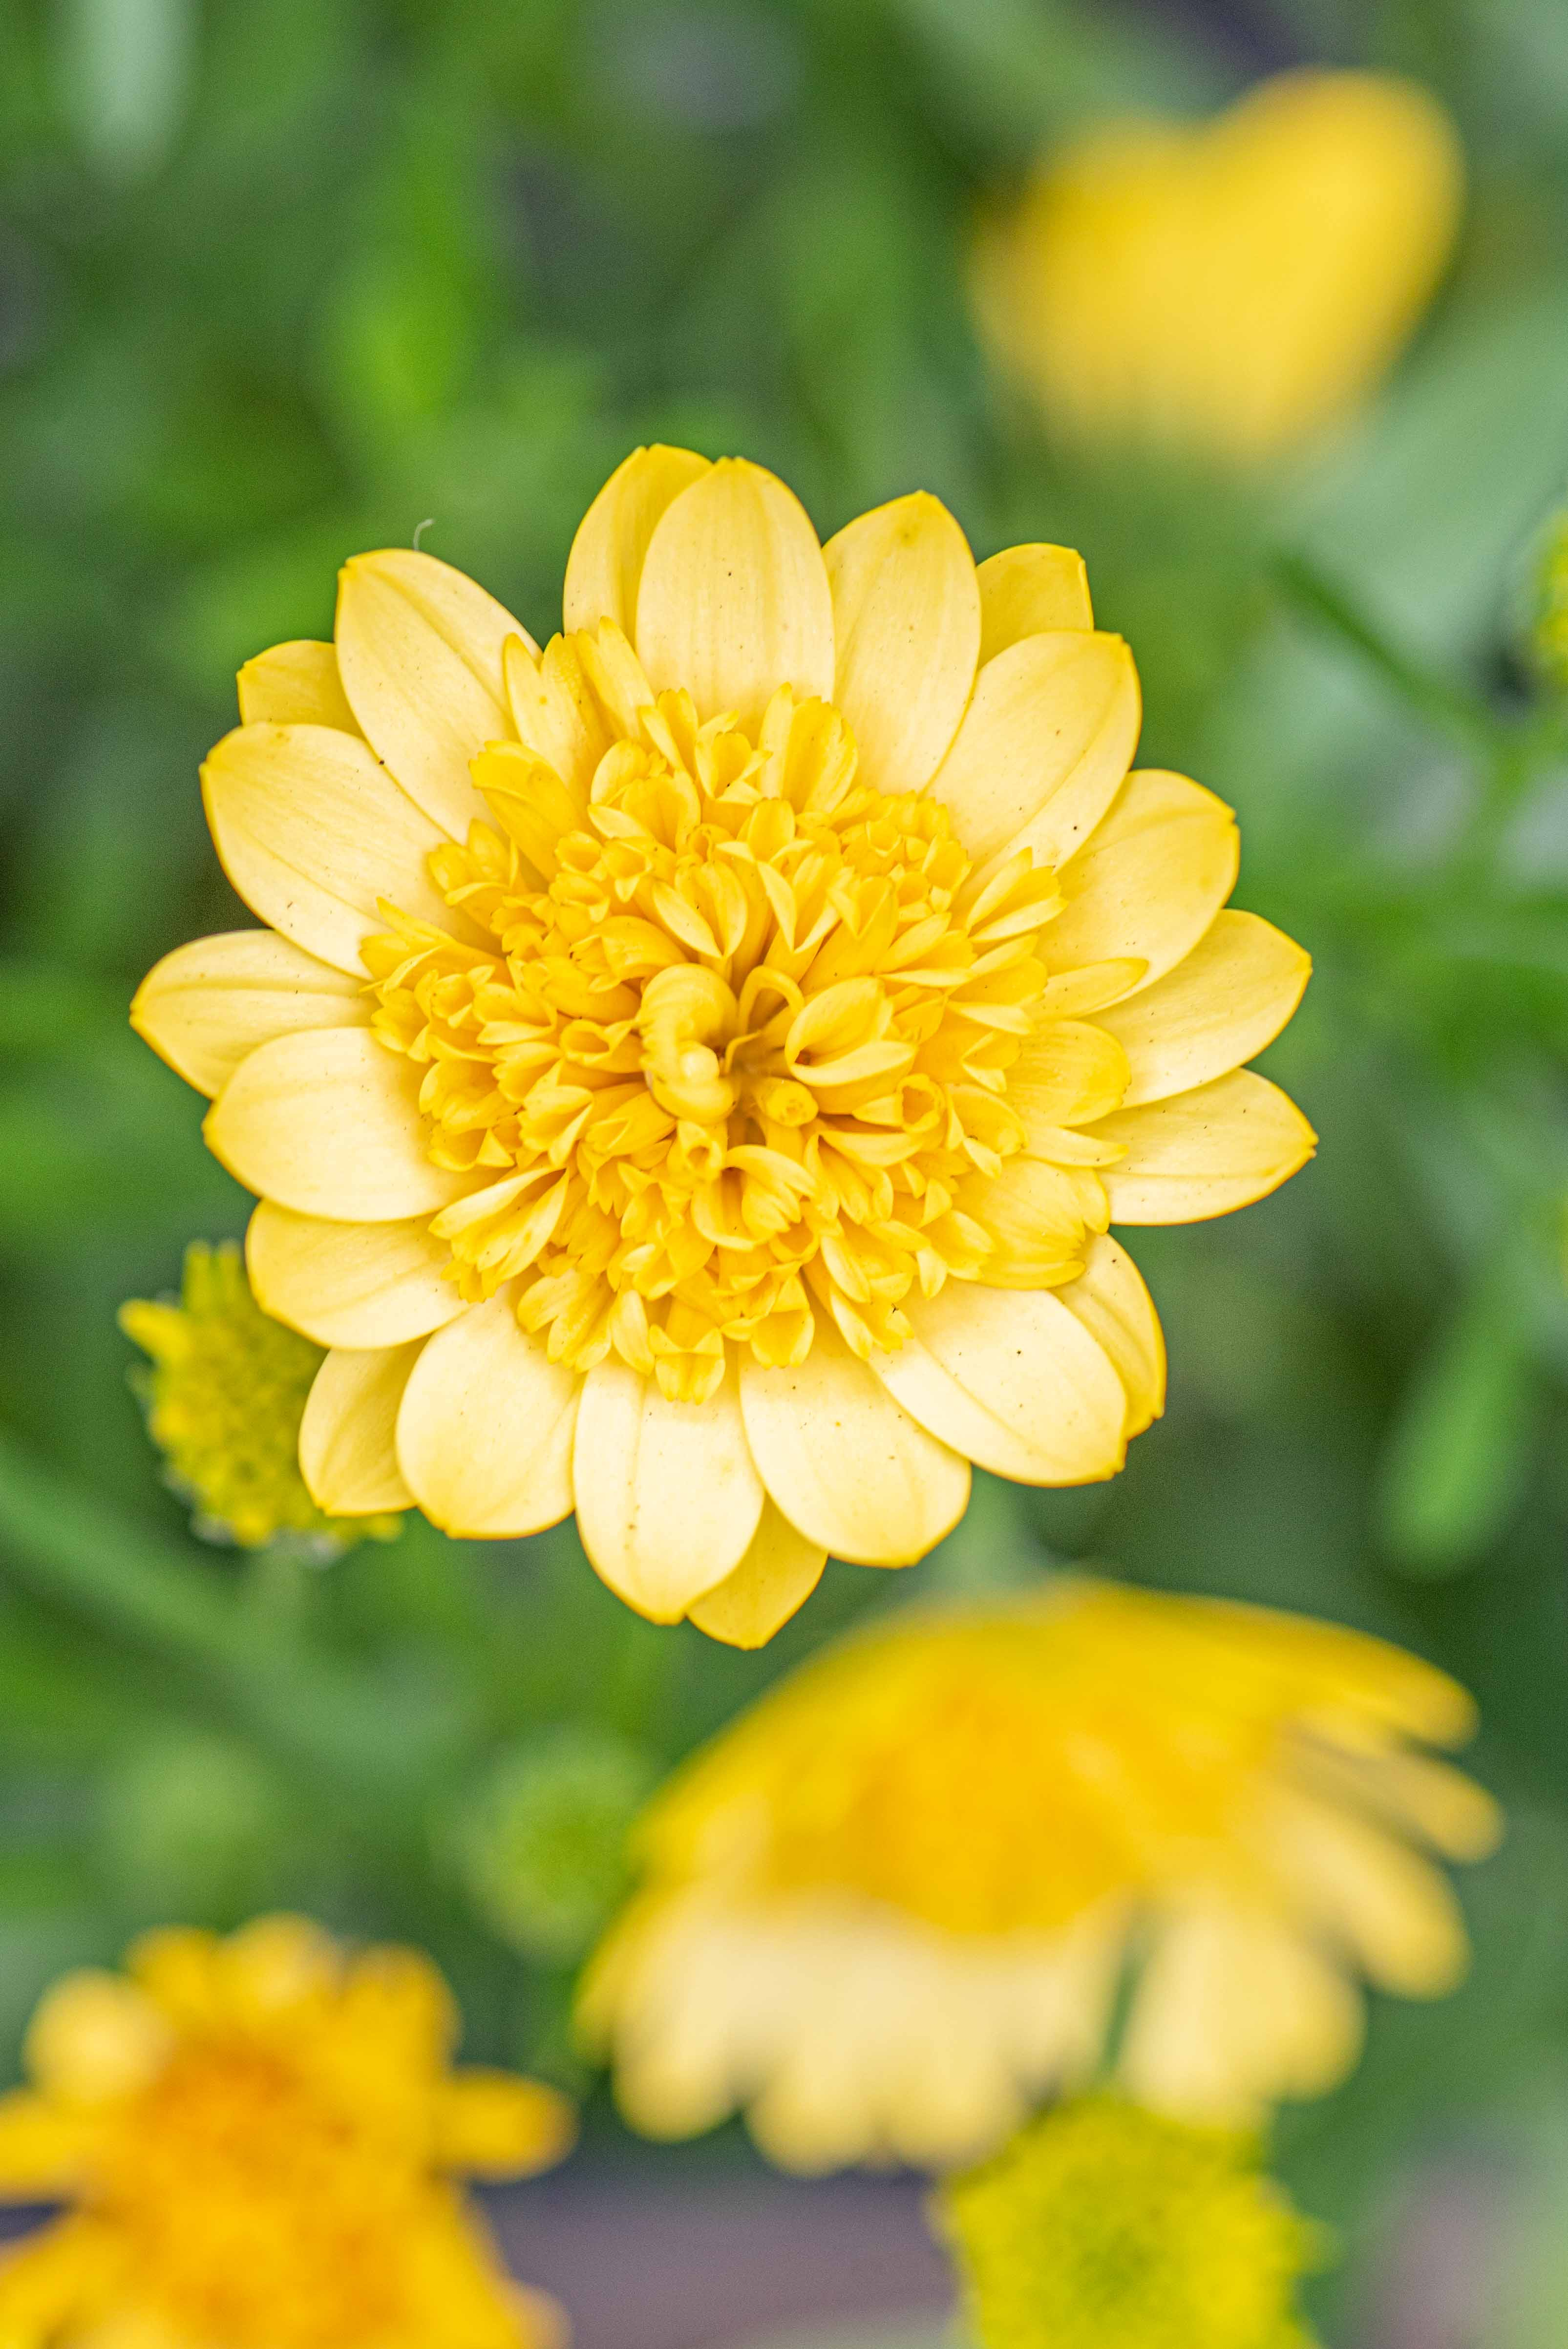 Osteospermum '4D Sunburst', Annual, African Daisy, Full Sun